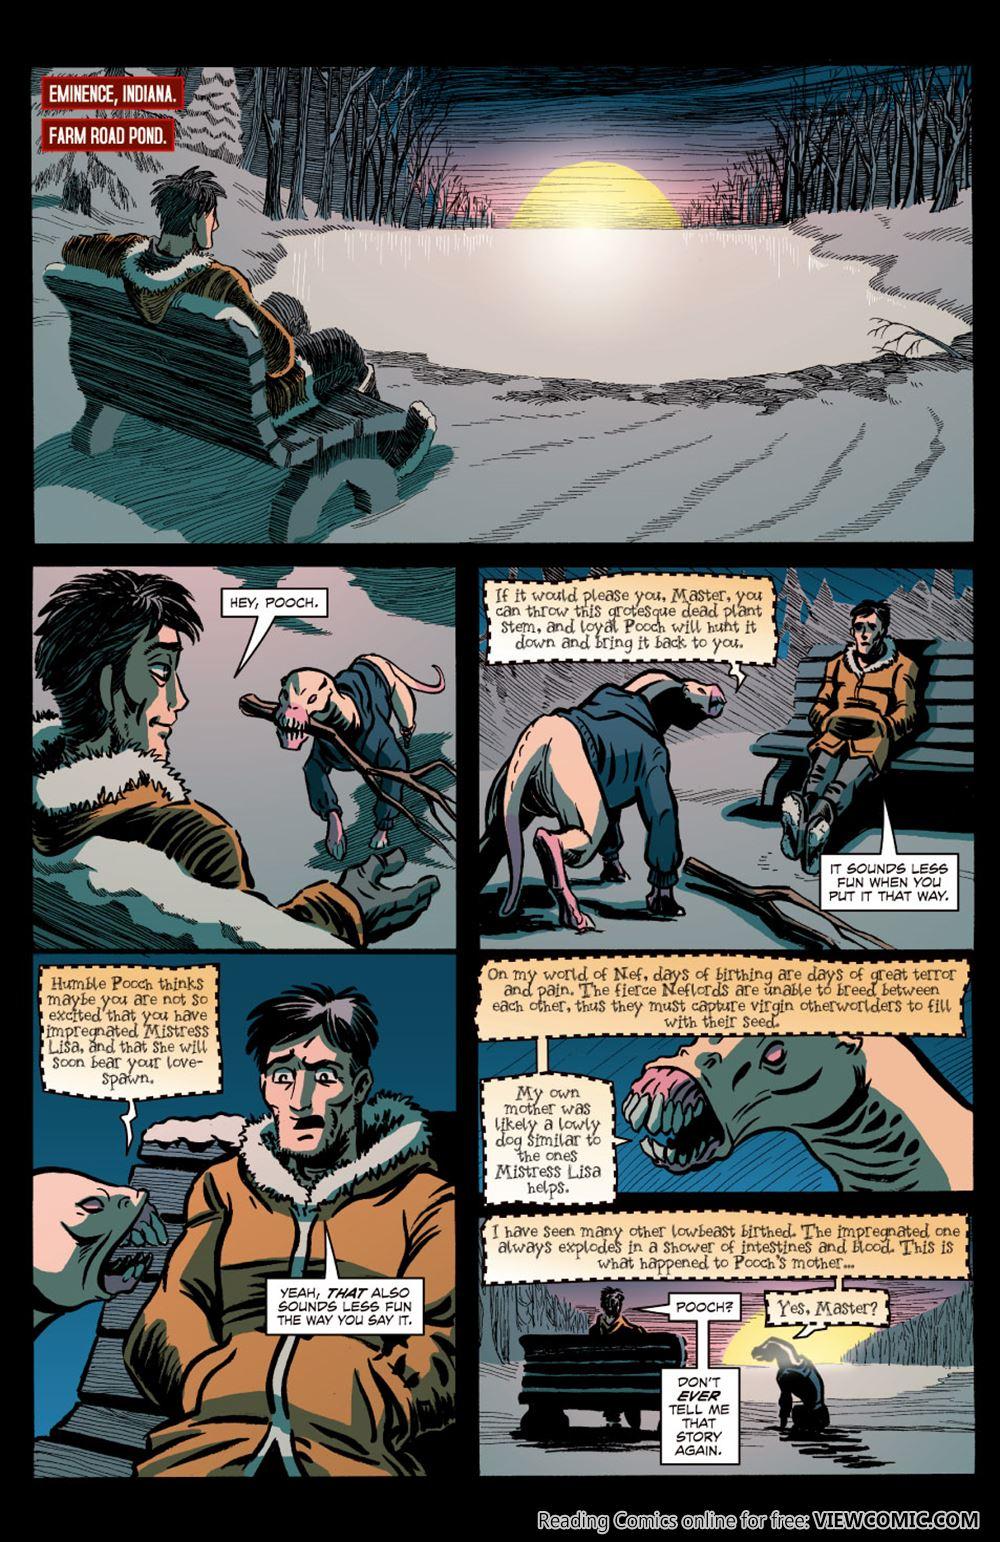 Impreg Comics Complete hack-slash – the series 025 (2009) | viewcomic reading comics